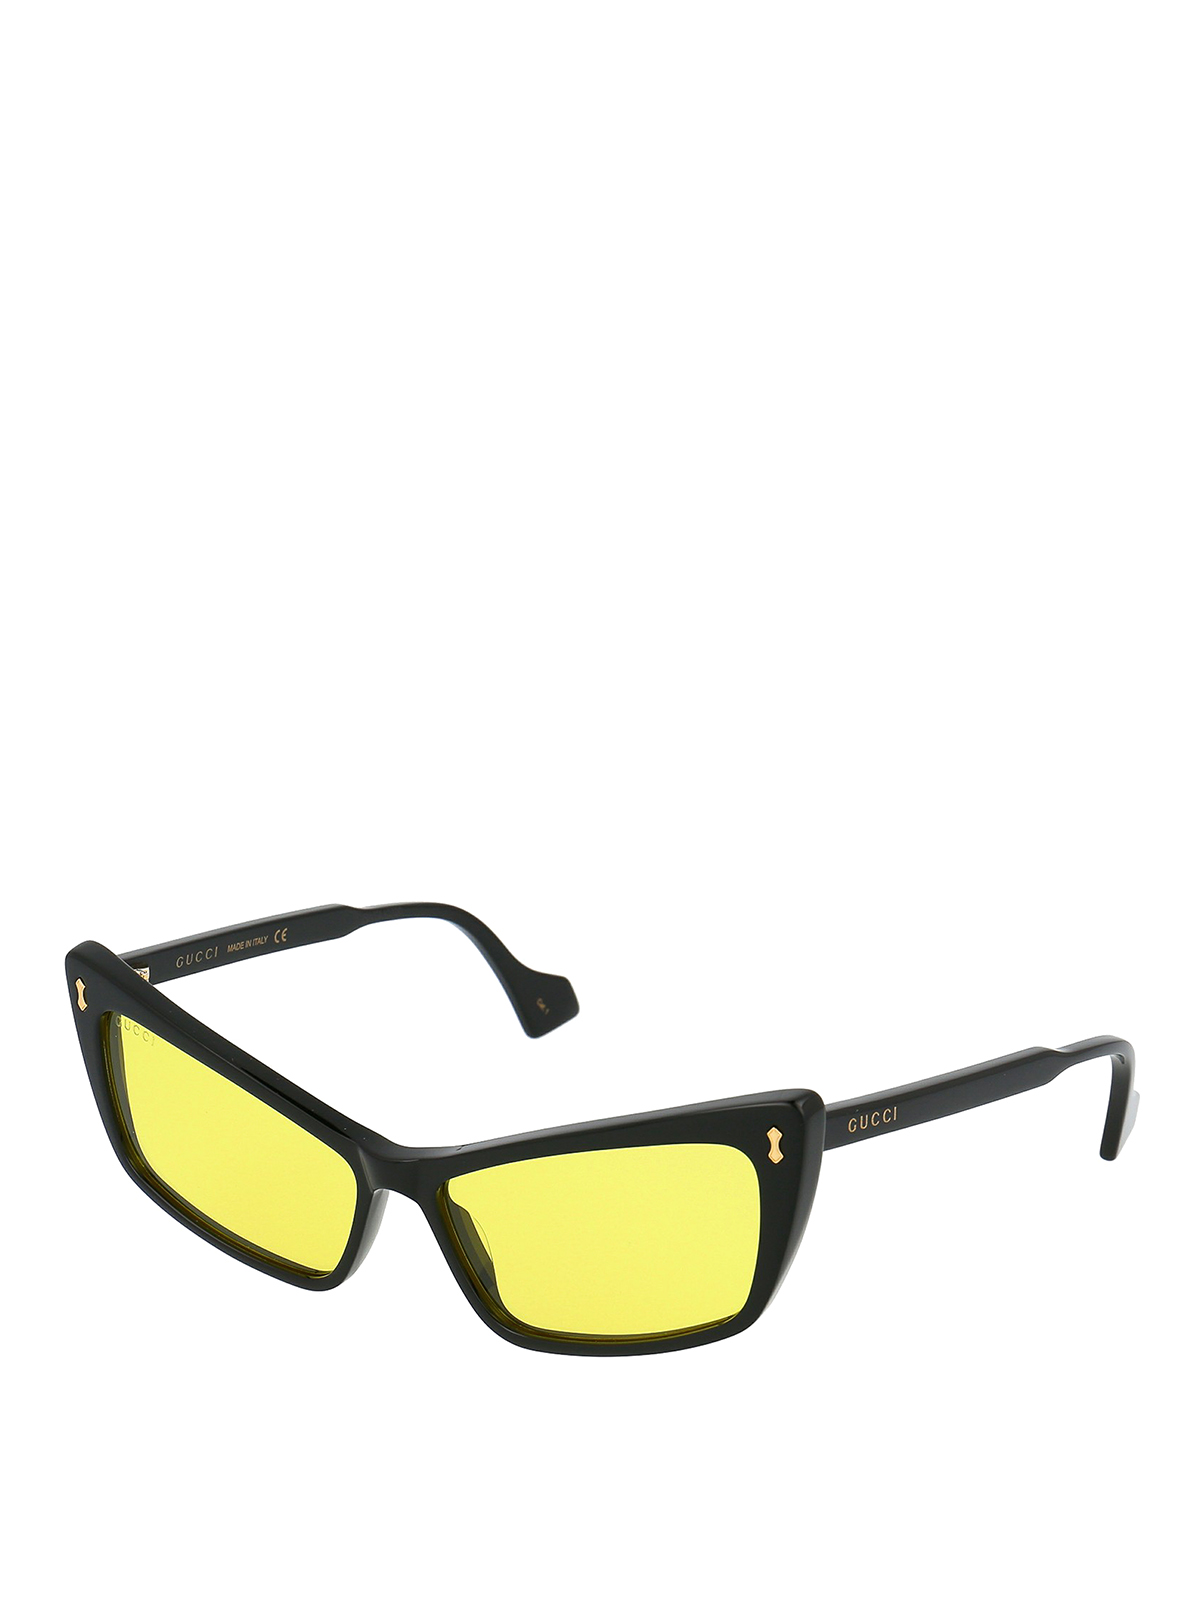 Gucci Tapered Lens Wayfarer Sunglasses In Black